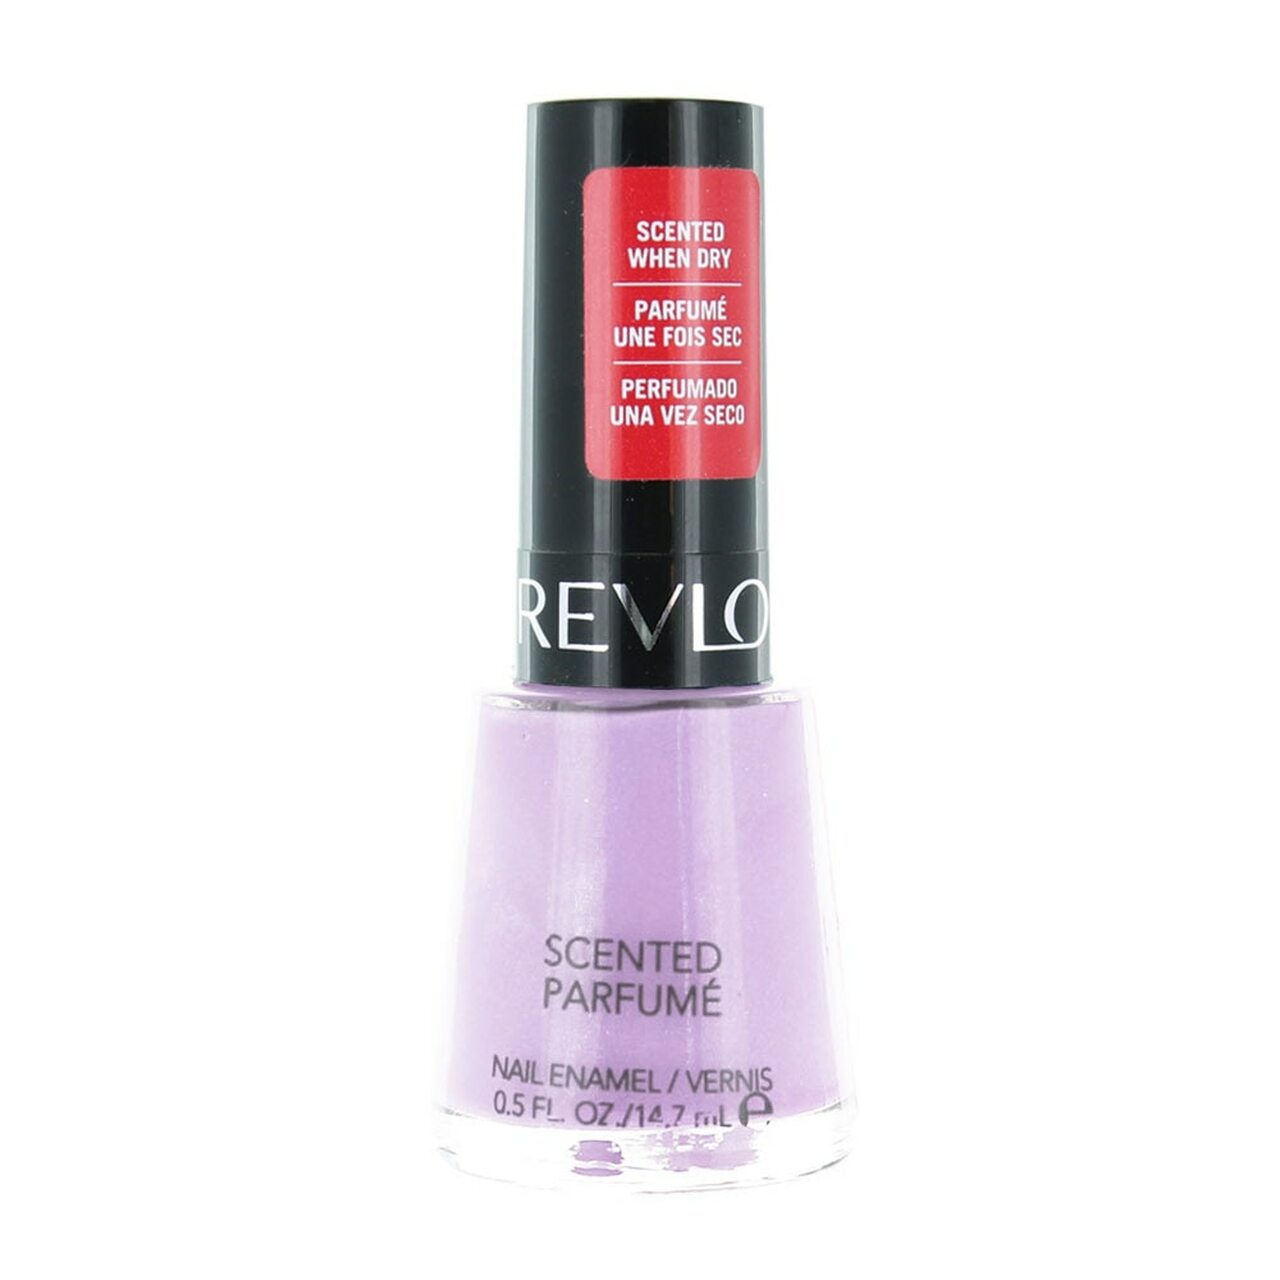 Revlon Scented Nail Enamel, .5oz - BuyMeBeauty.com